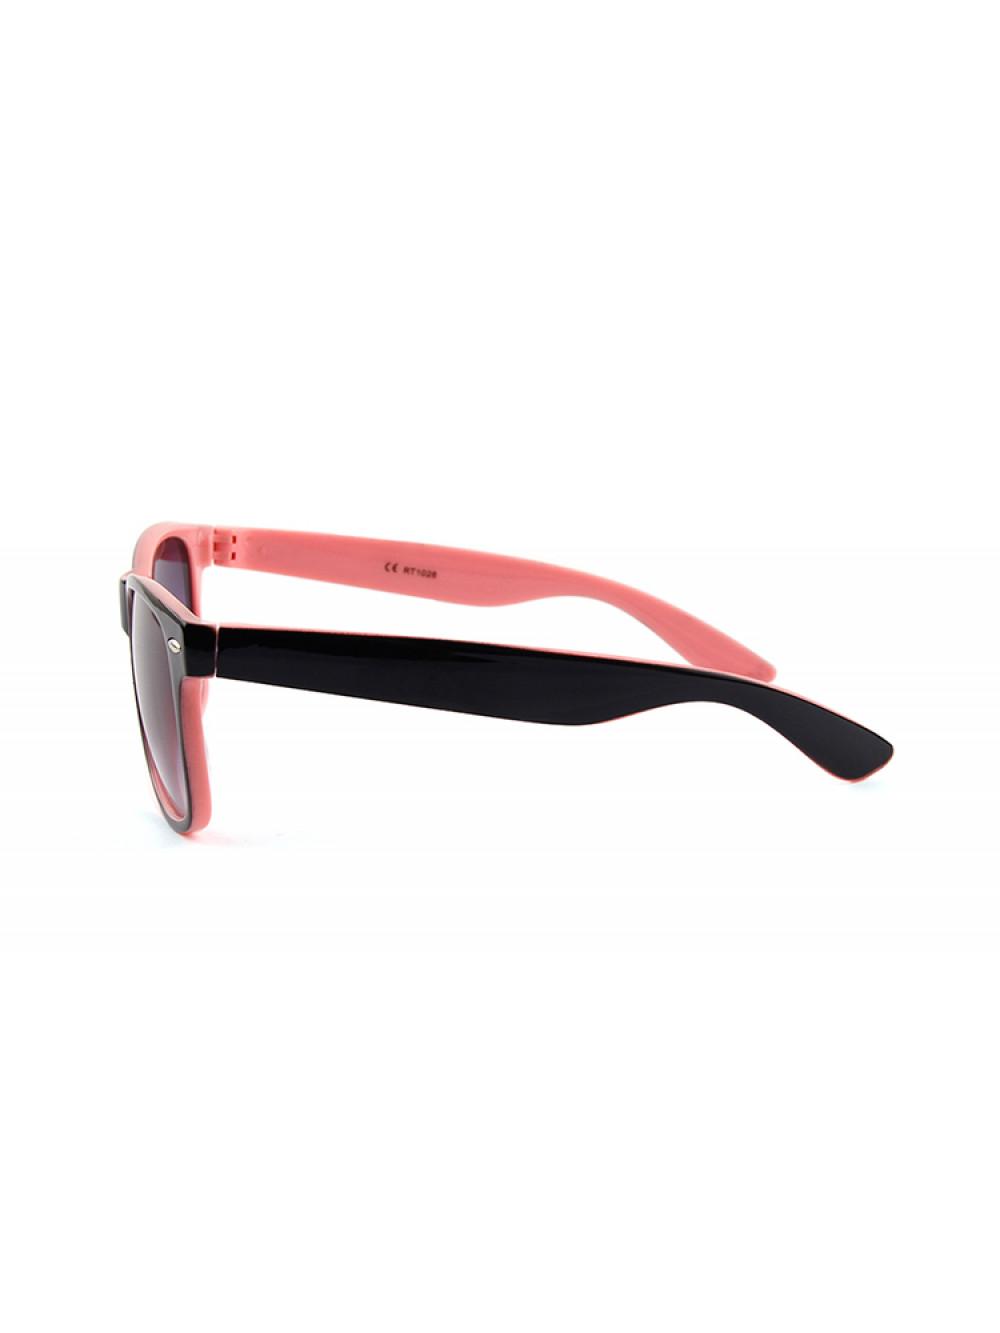 Slnečné okuliare Wayfarer Duo Pink 79bbd5388aa